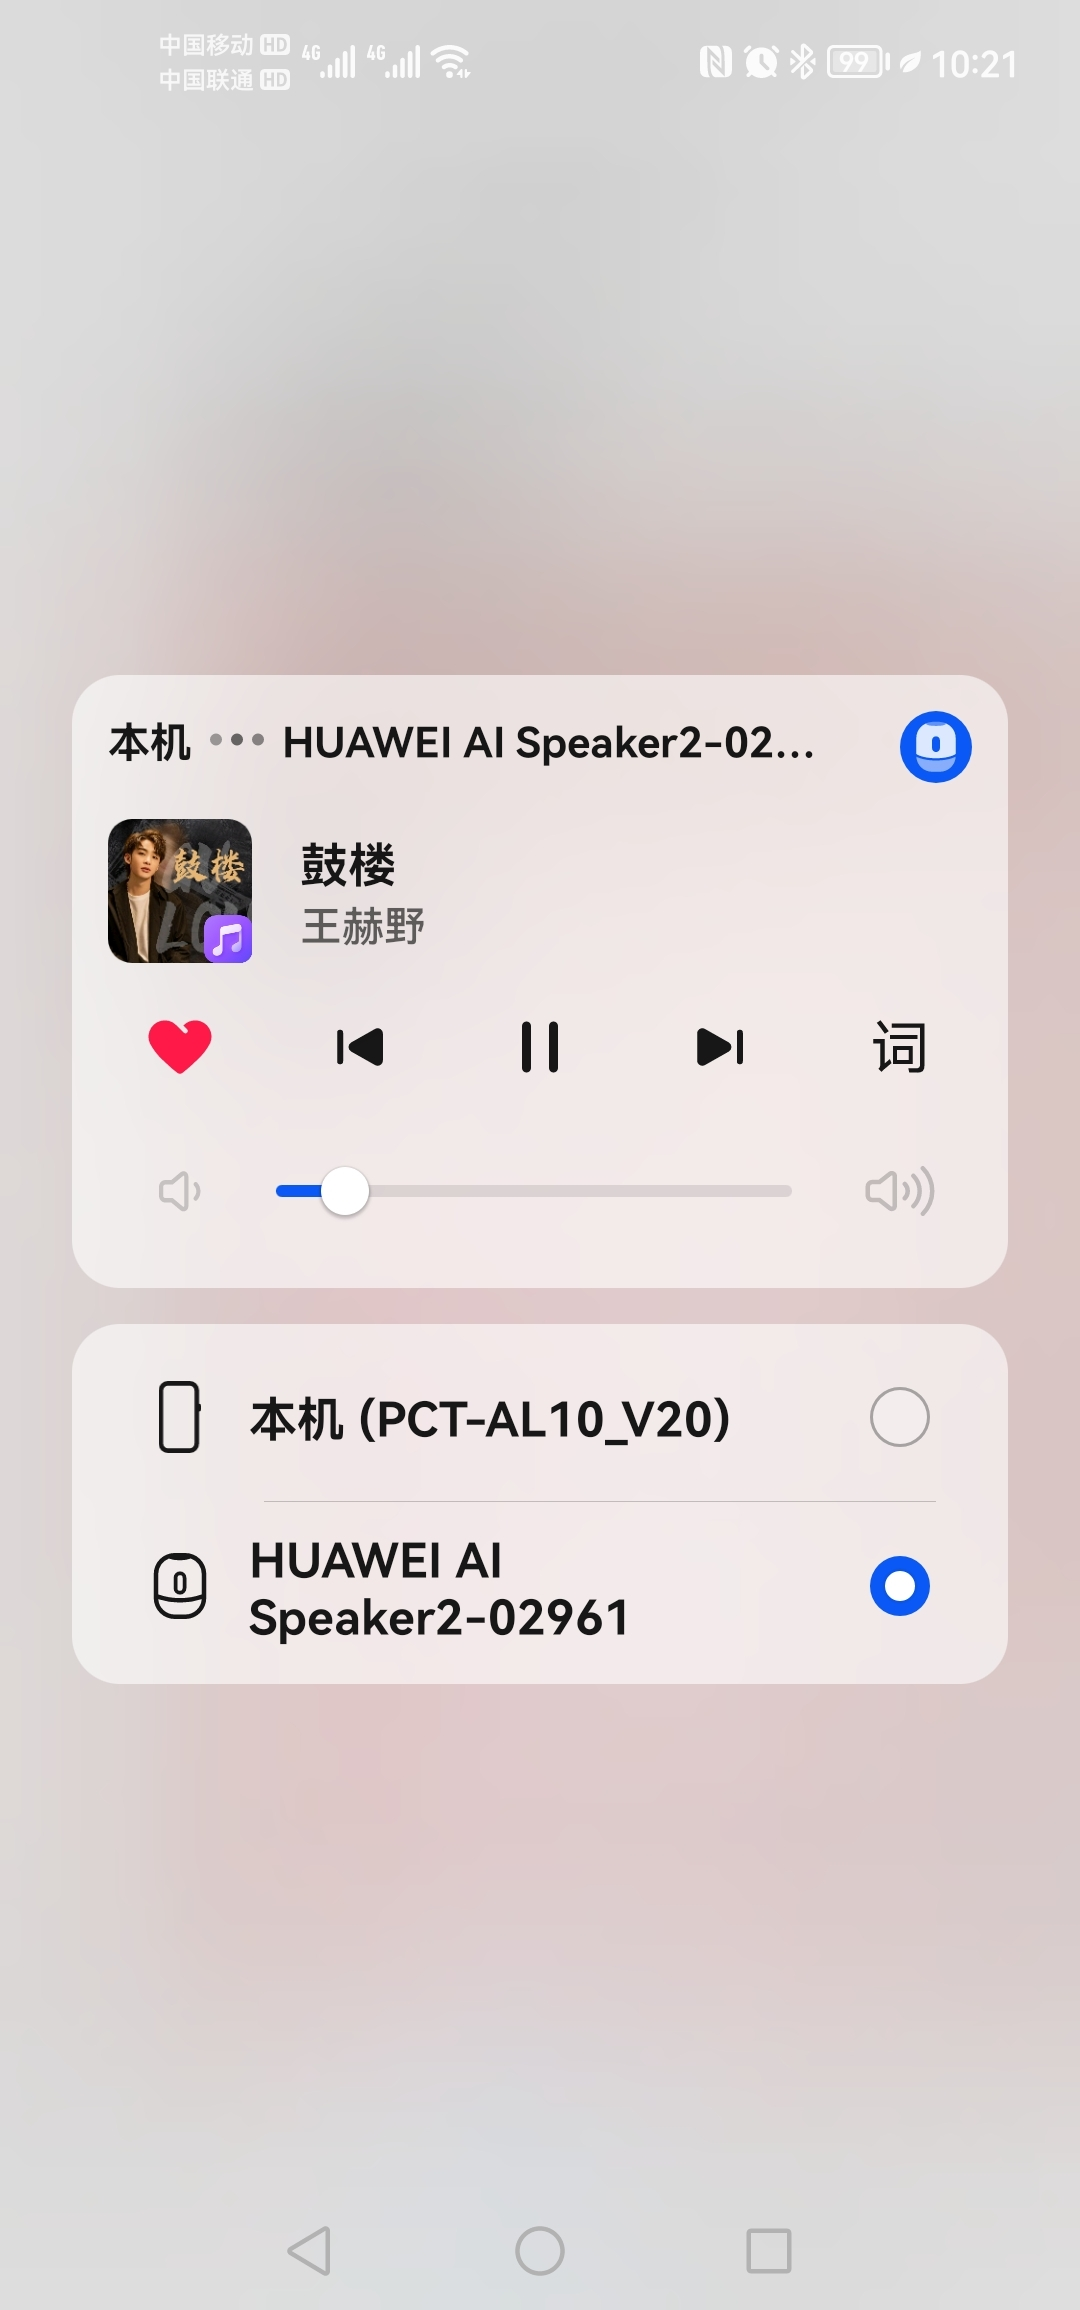 Screenshot_20210921_102128_com.huawei.mediacontroller.jpg